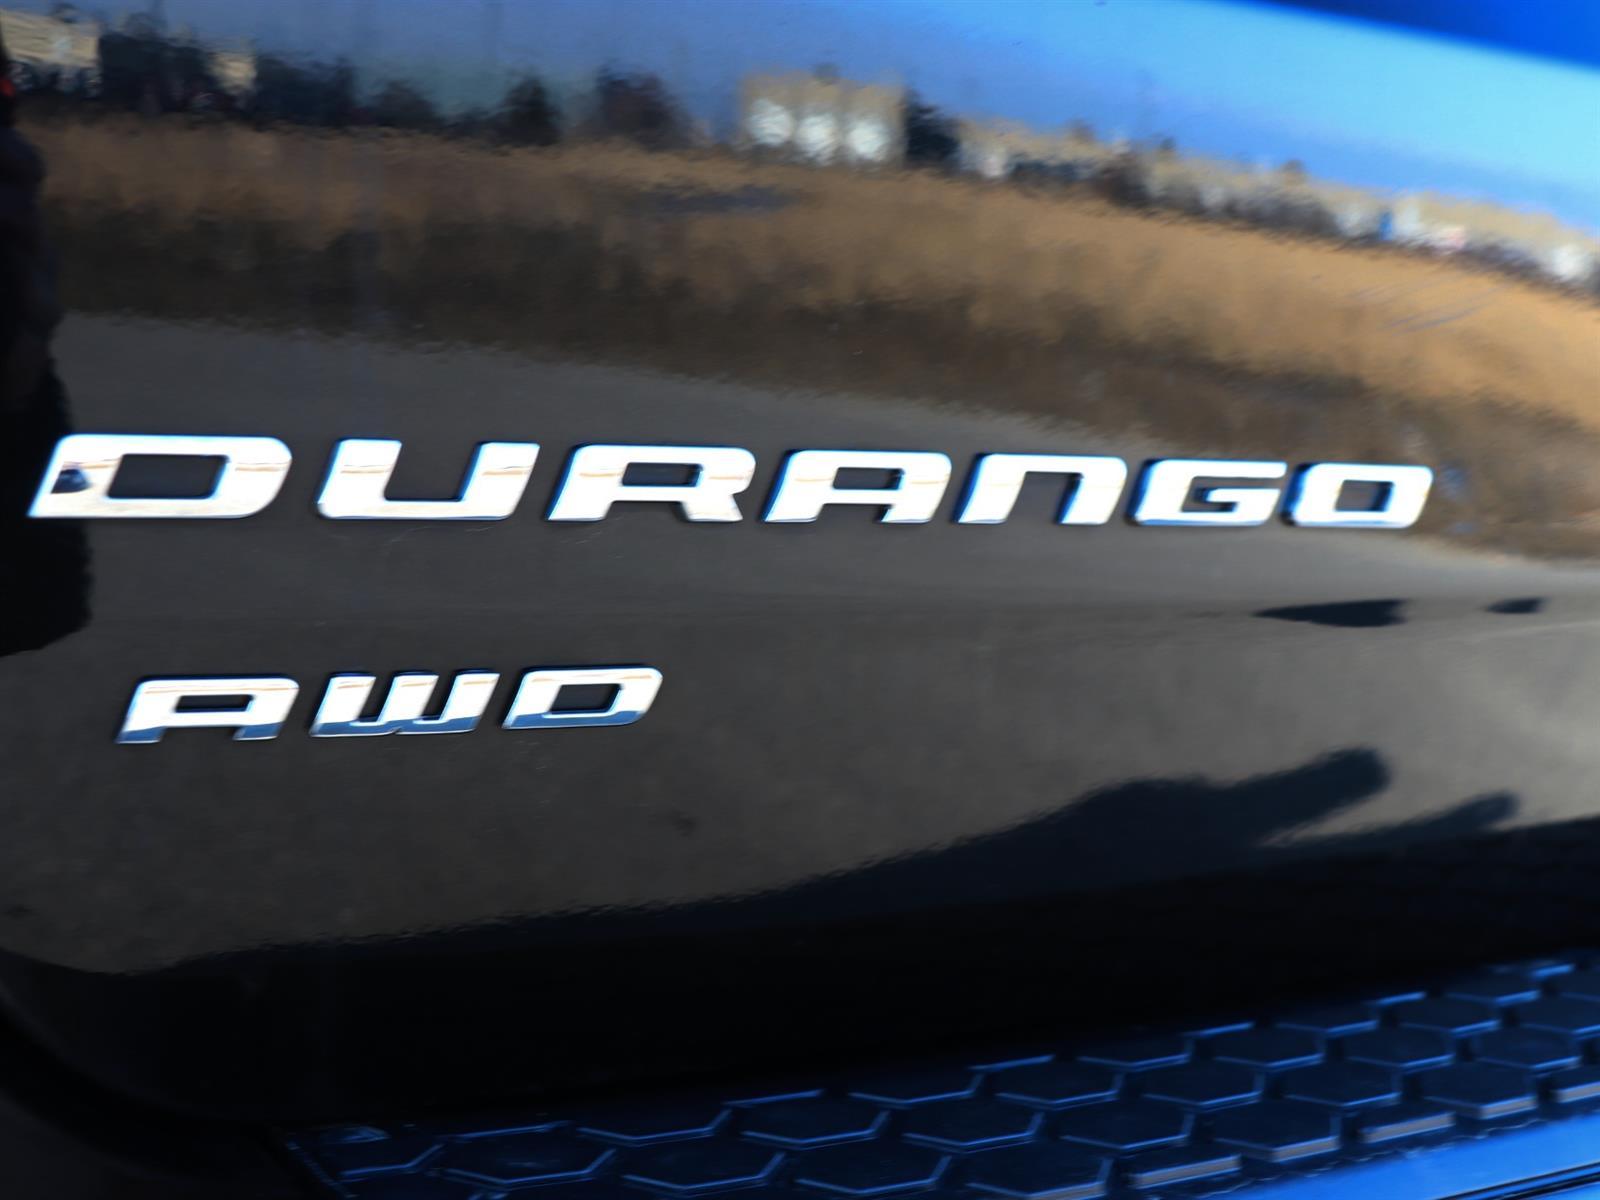 Used 2015 Dodge Durango in London,ON